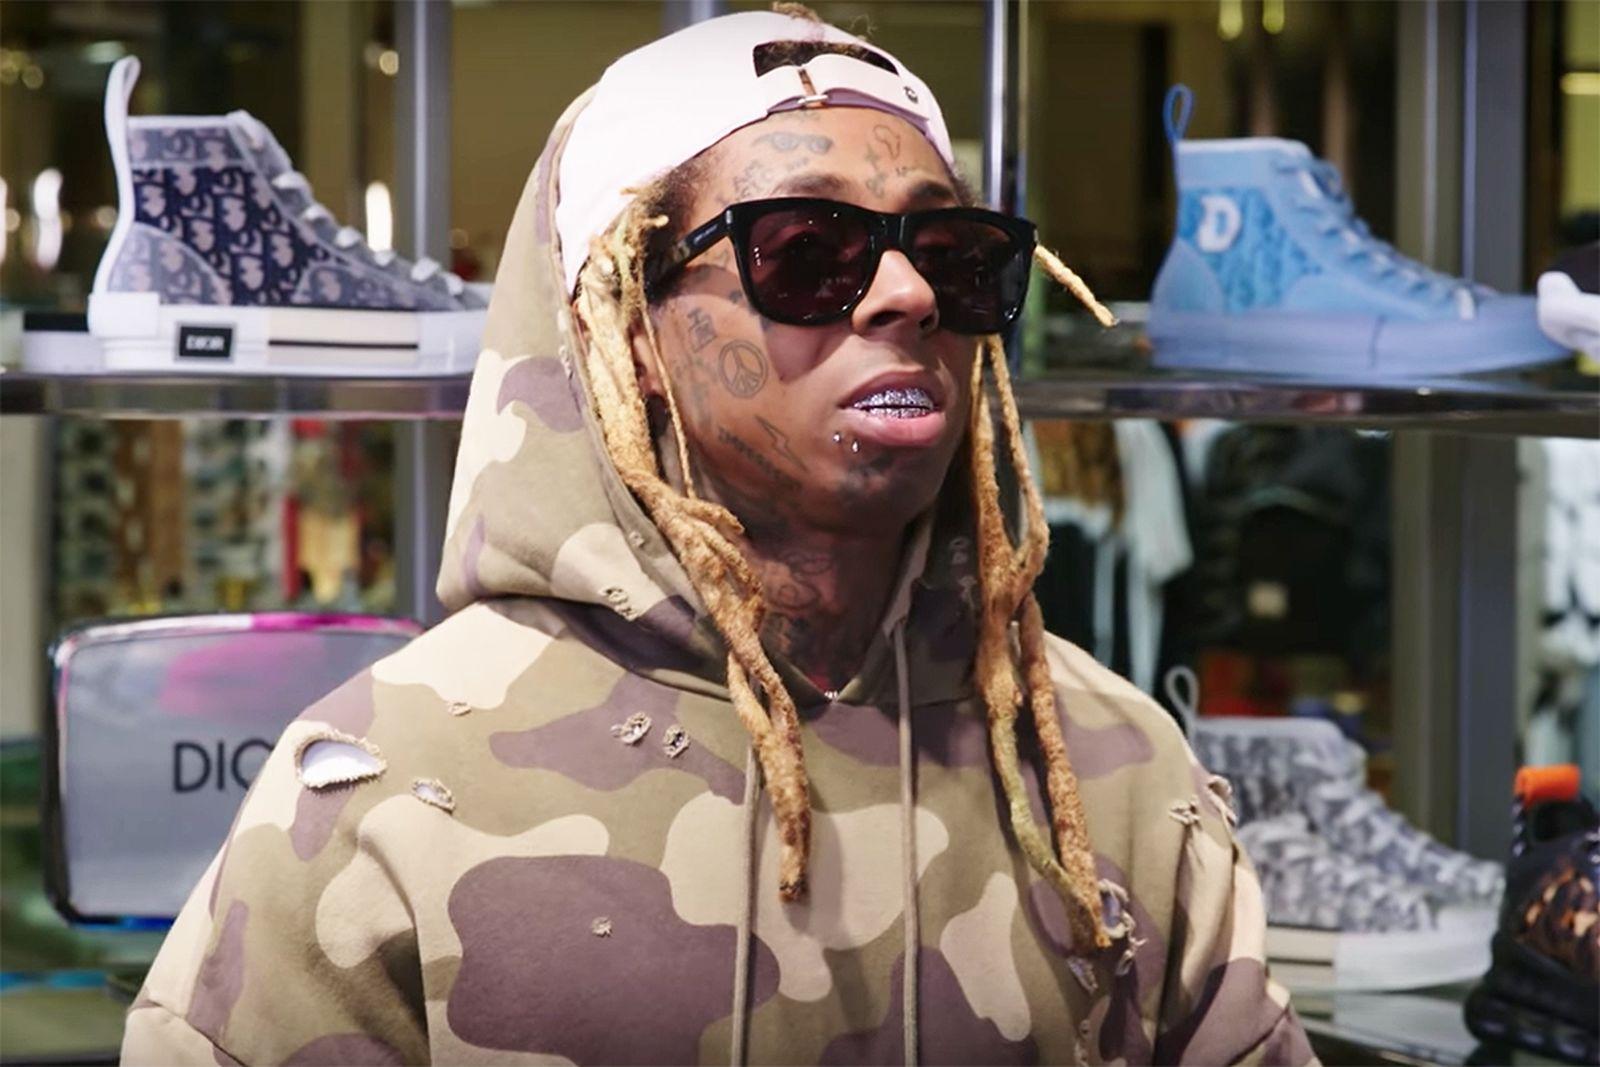 Lil Wayne Sneaker Shopping